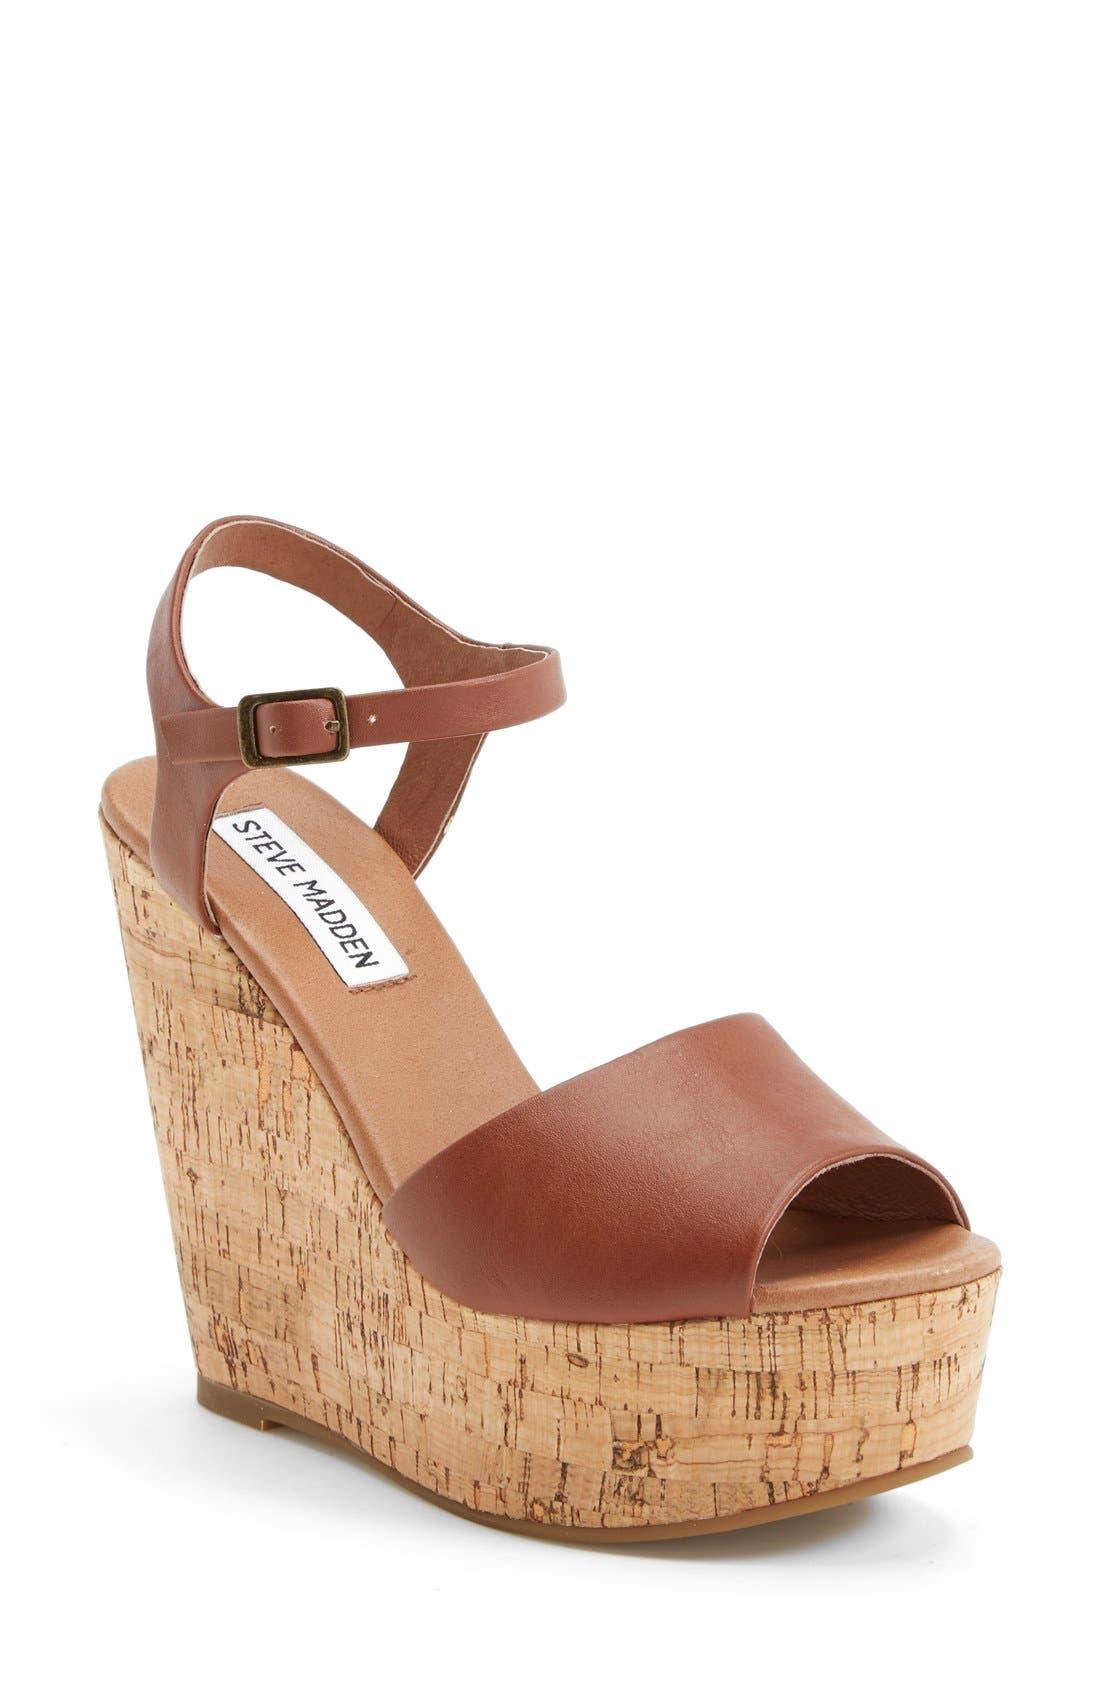 Alternate Image 1 Selected - Steve Madden 'Korkey' Ankle Strap Wedge Platform Sandal (Women)